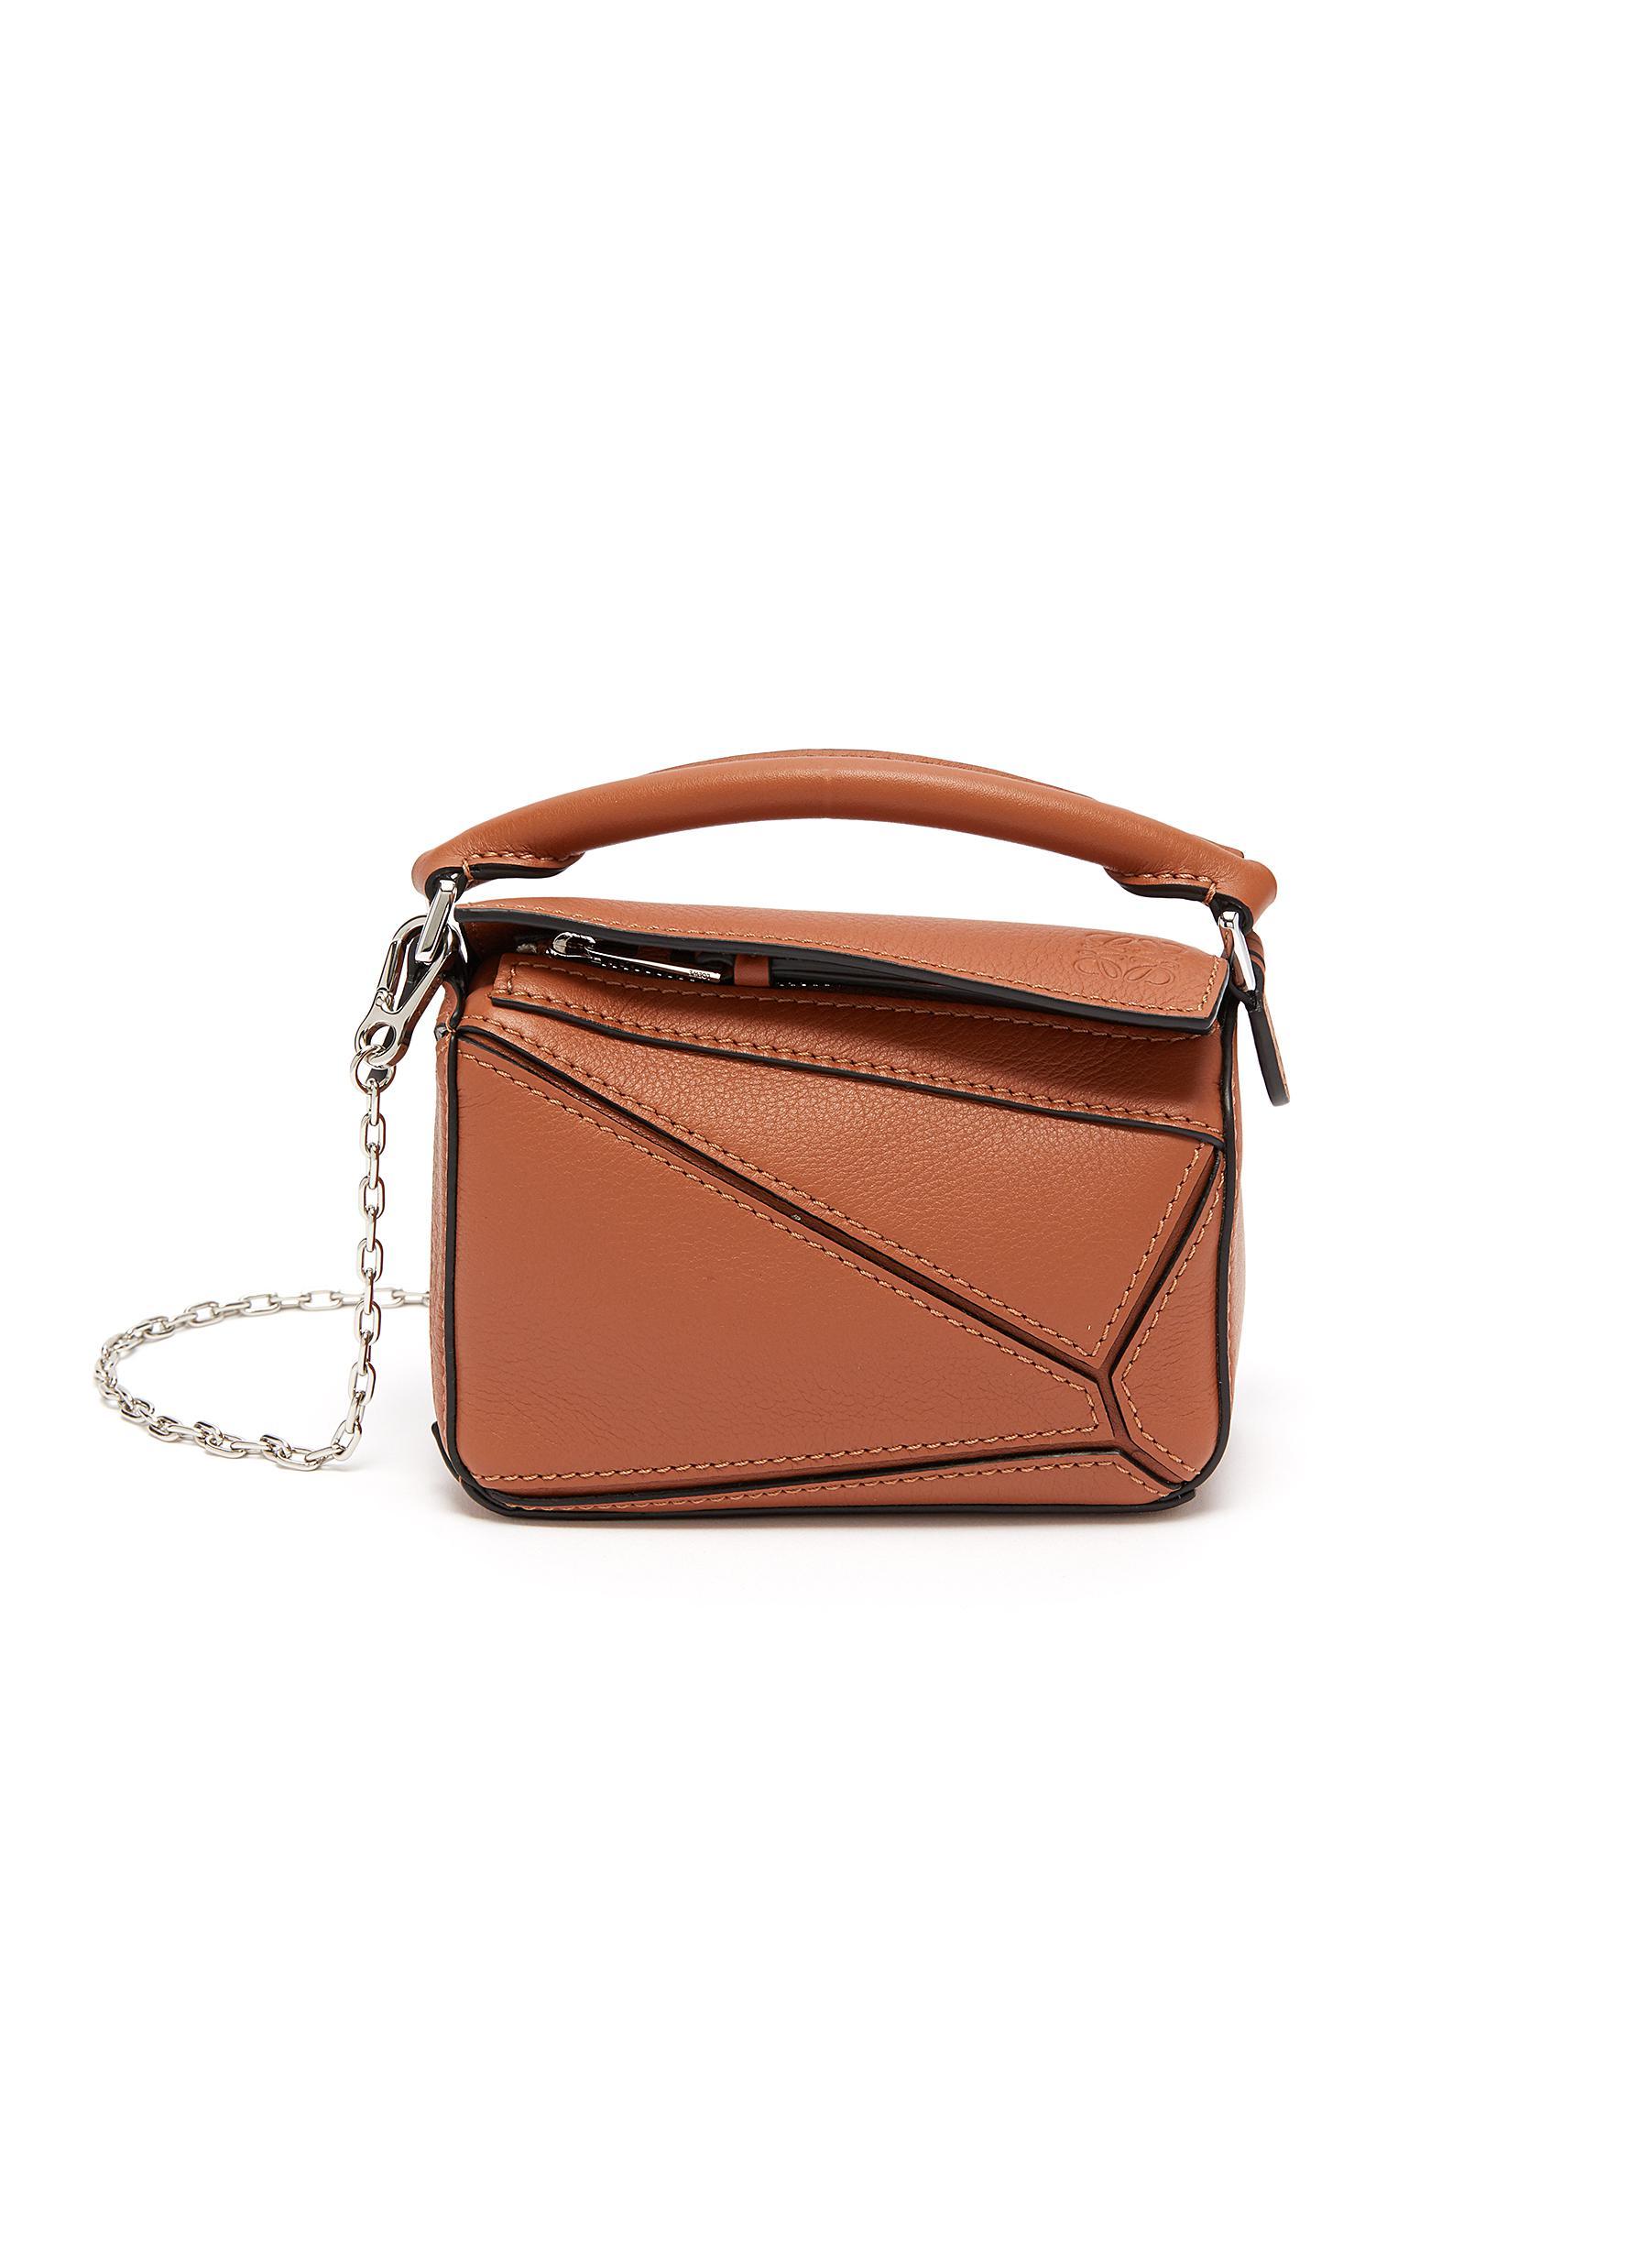 Loewe Puzzle' Geometric Panel Nano Leather Bag In Brown